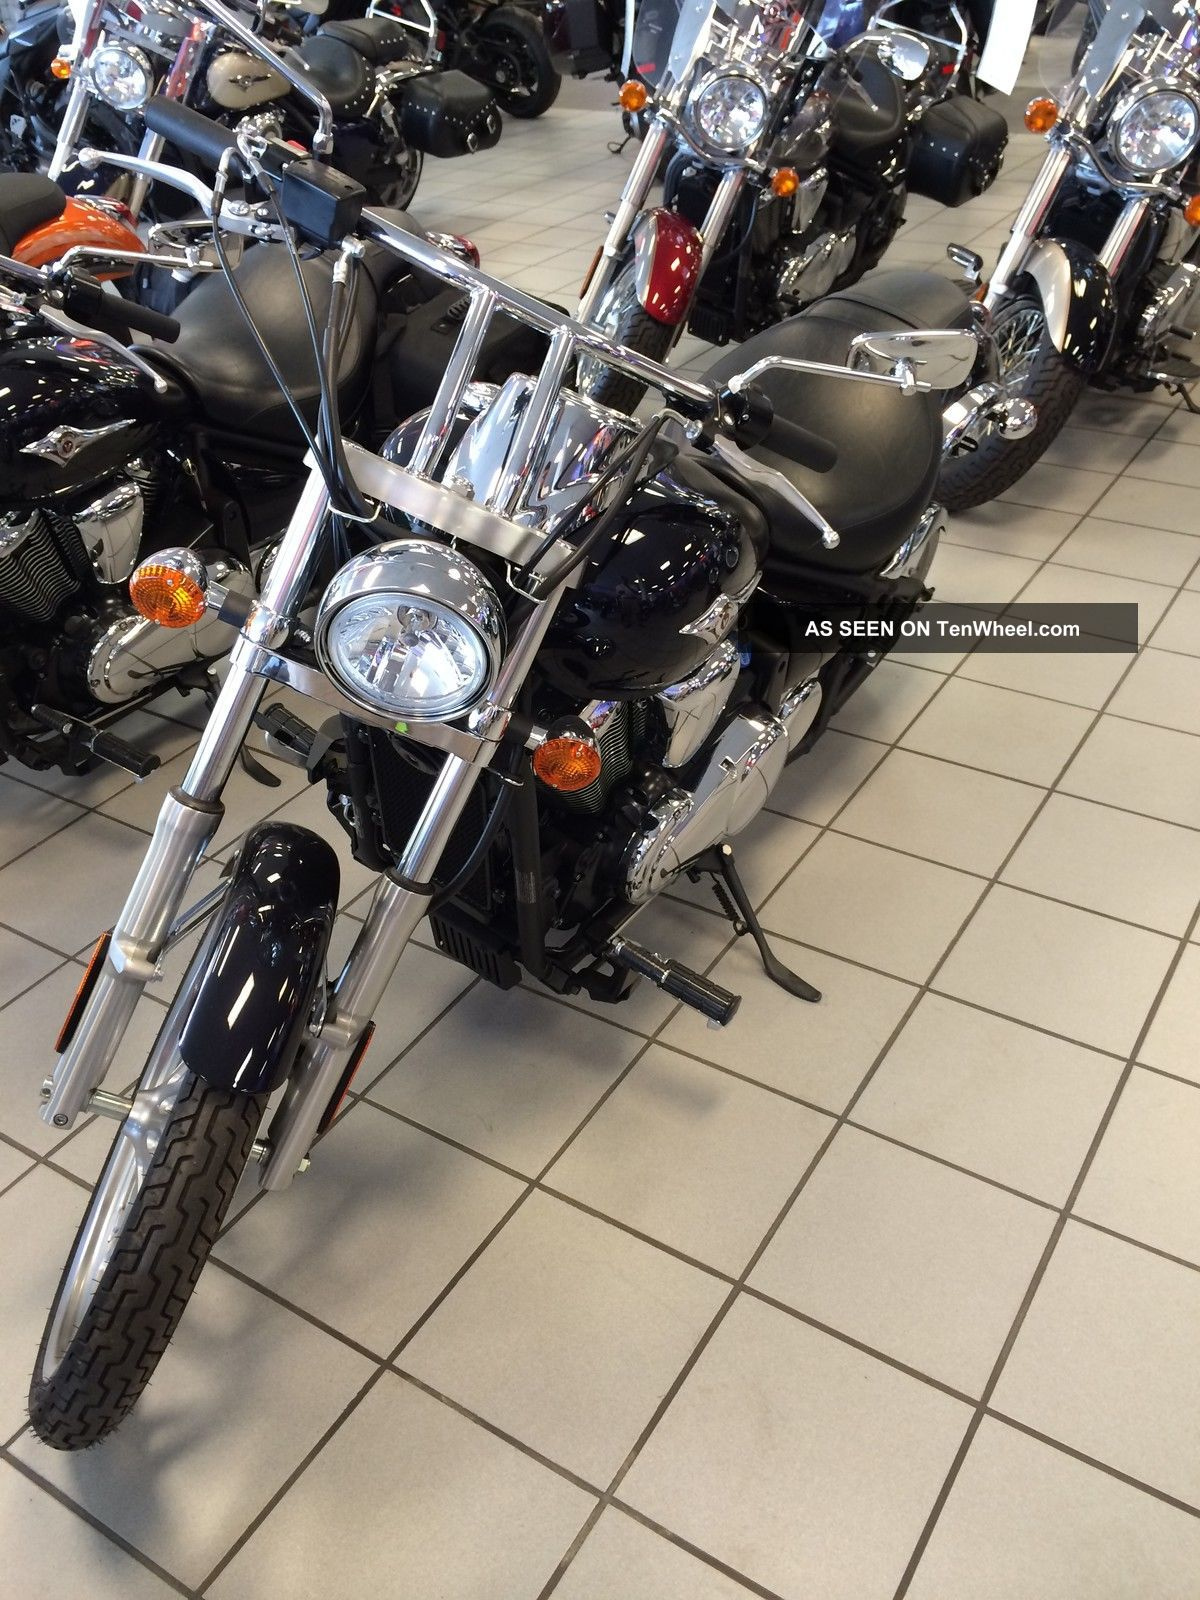 2012 Kawasaki Vulcan 900 Custom Purple / Black Vn900ccf Vulcan photo